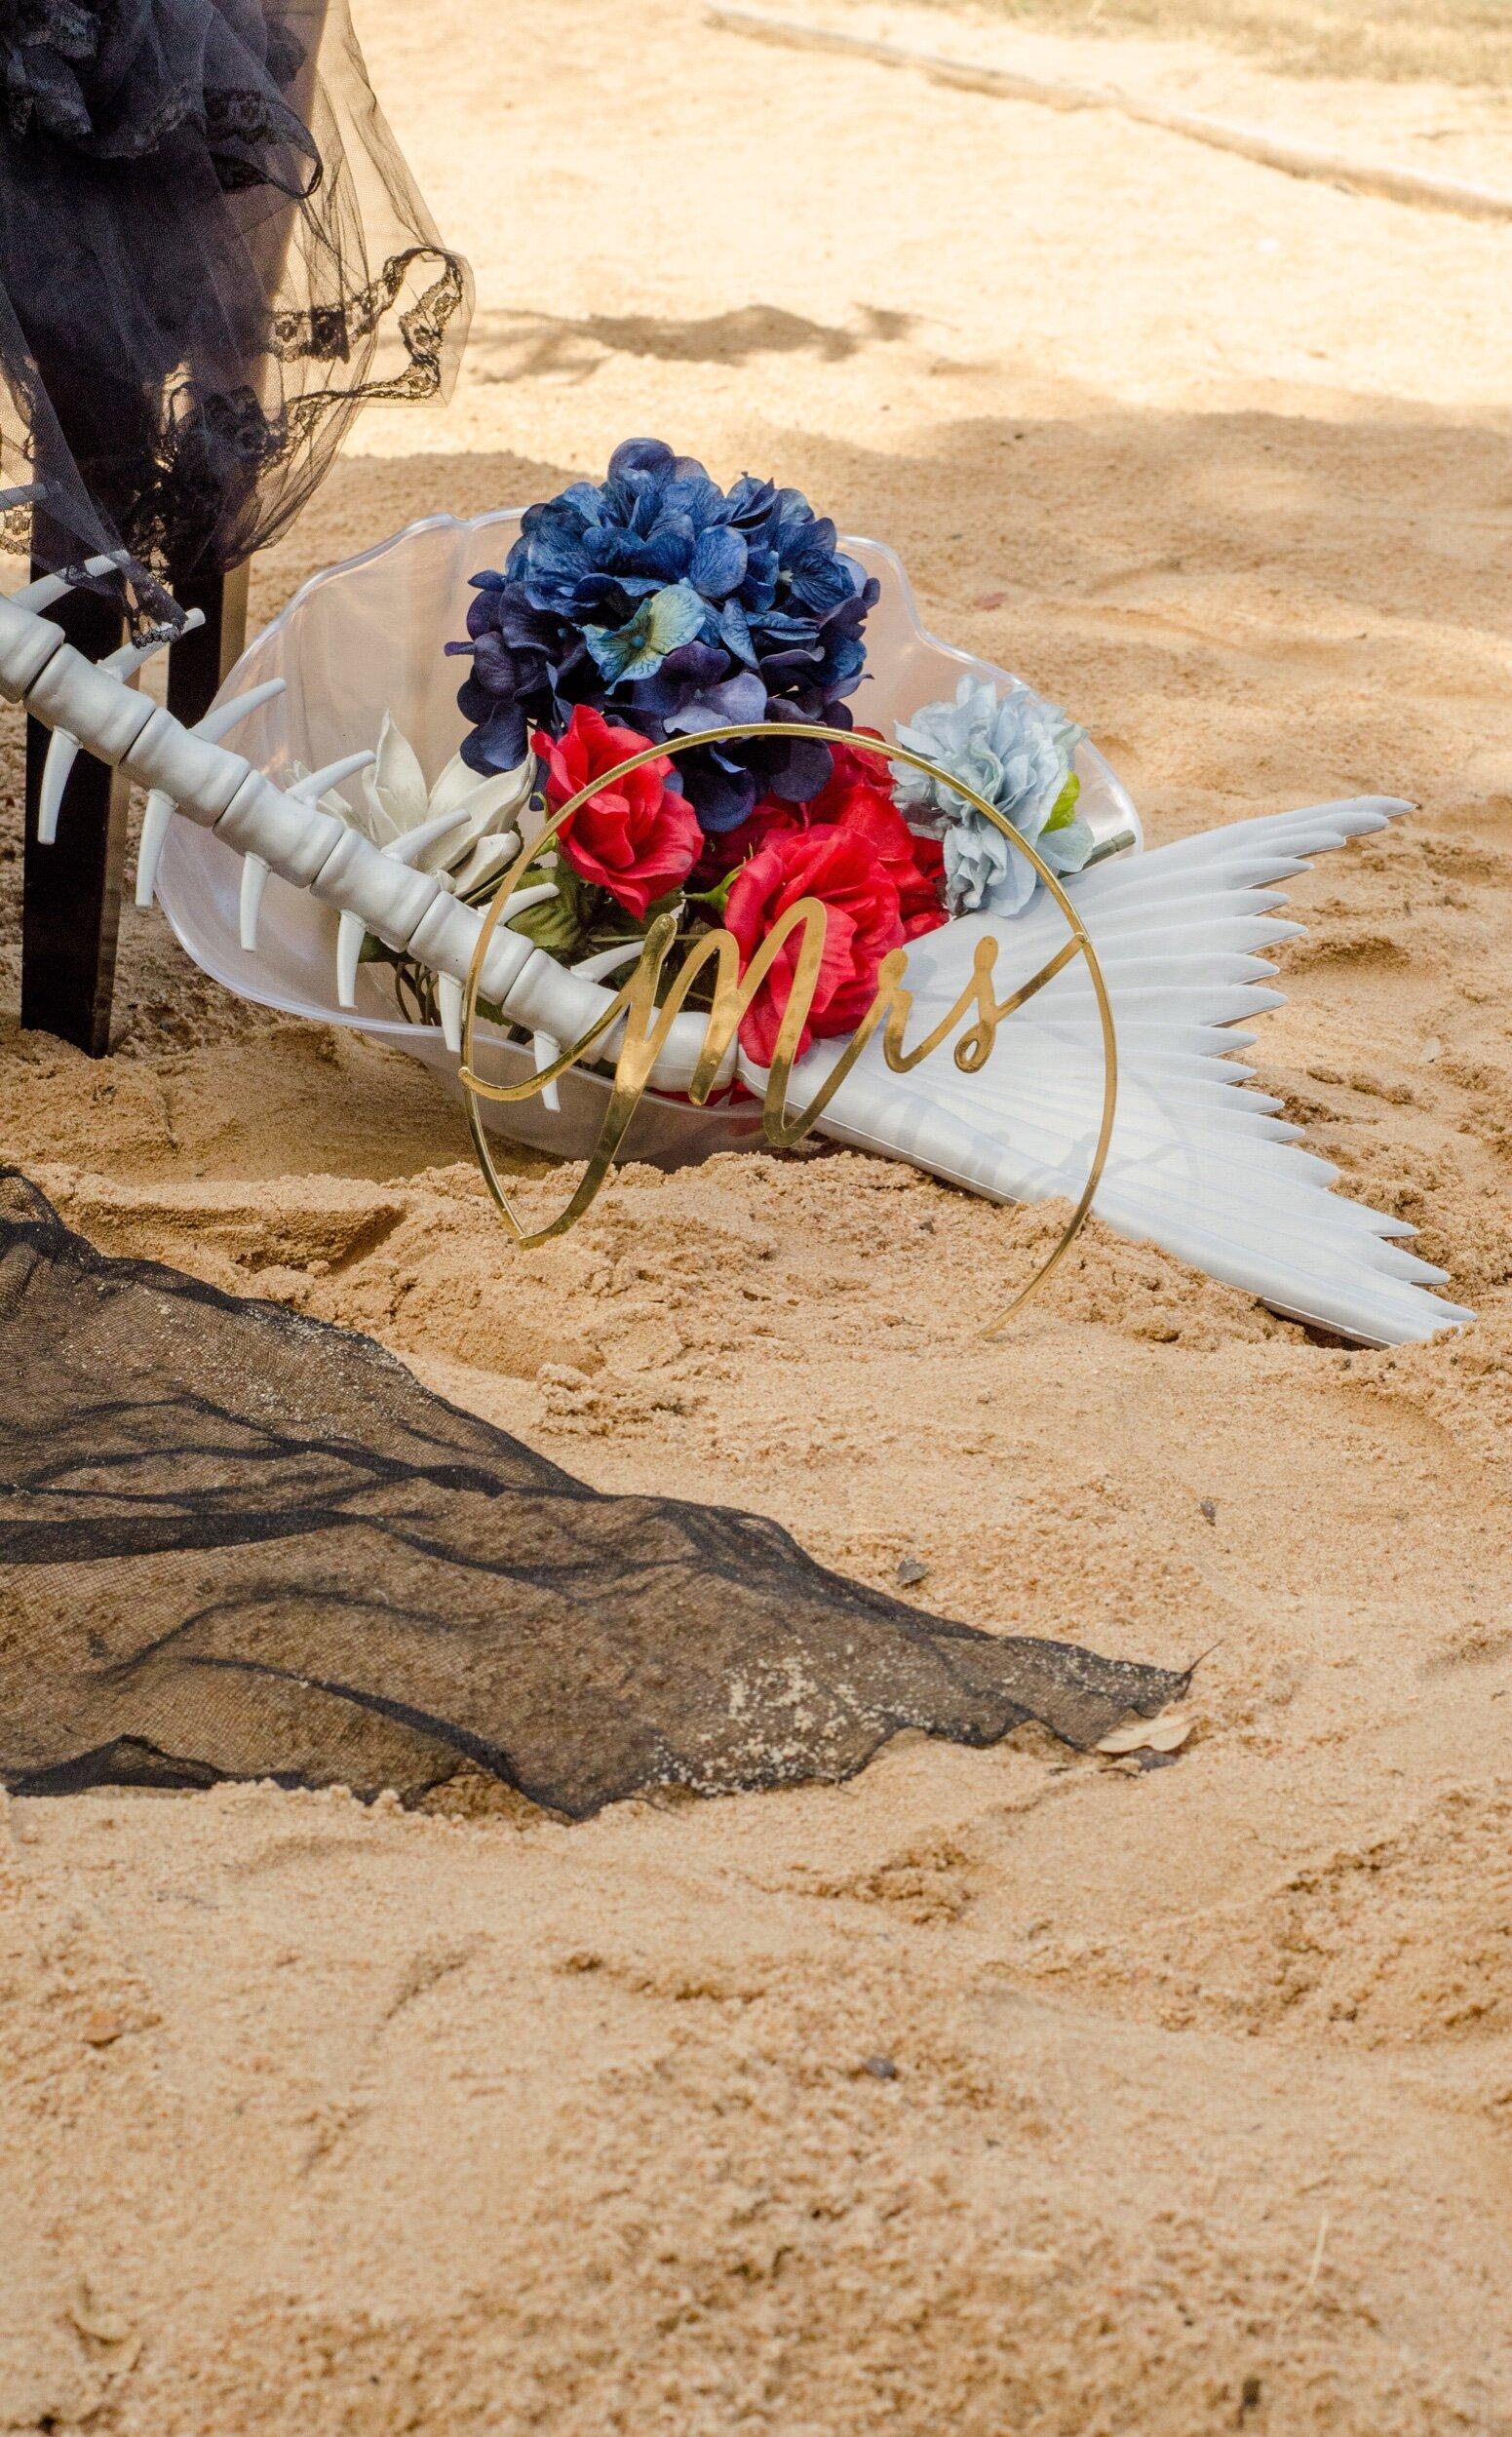 Mermaid skeleton halloween wedding display - as seen on Mint Event Design